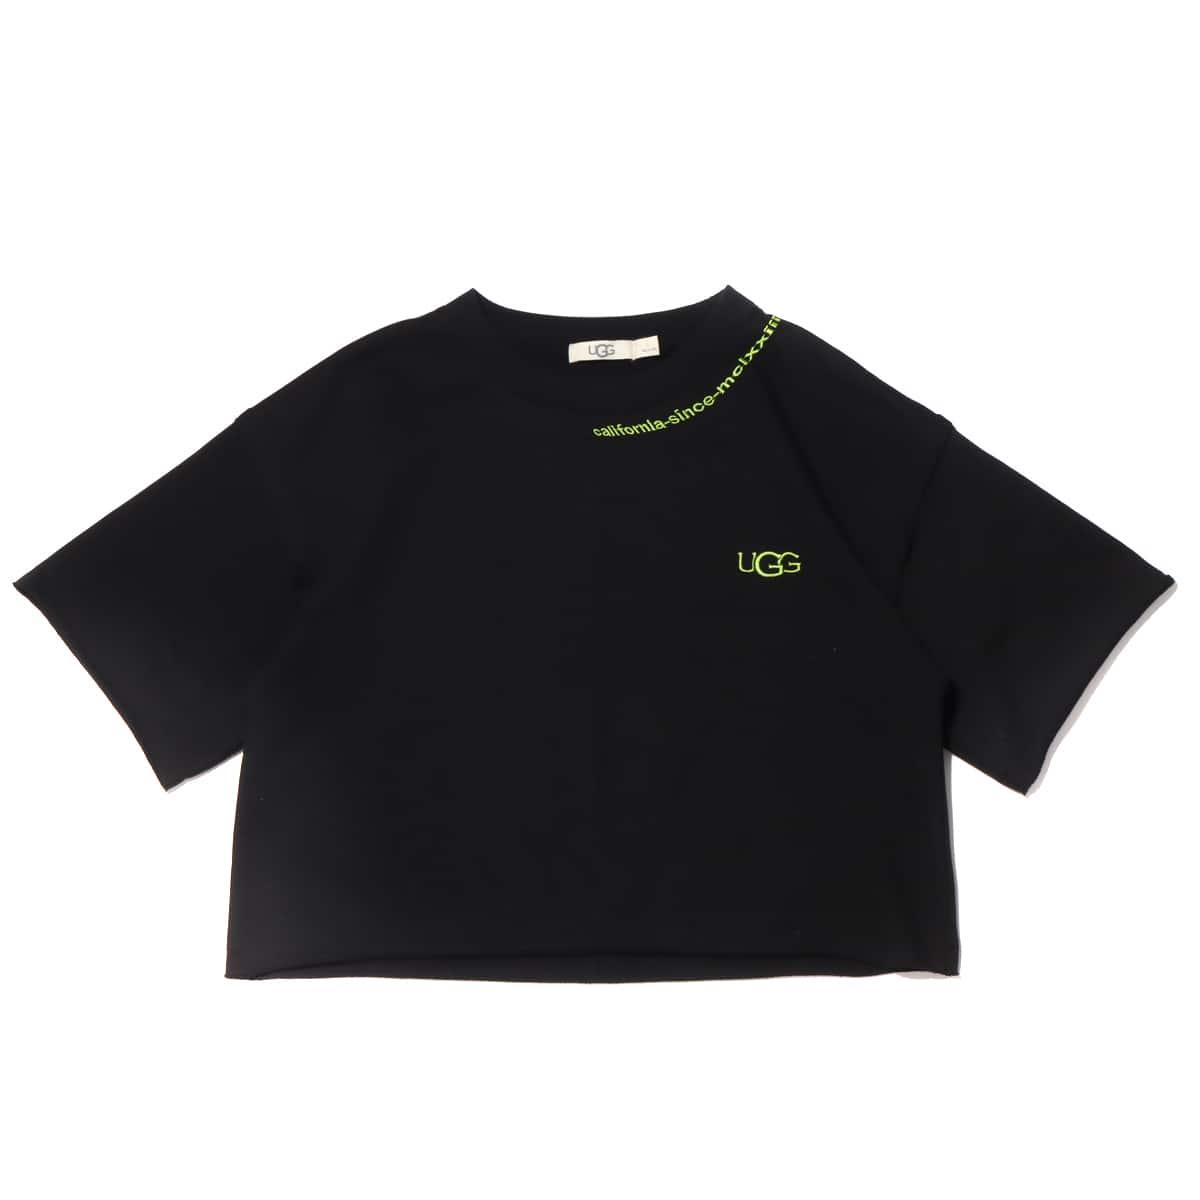 UGG 半袖 スウェットトップス BLACK 21SS-I_photo_large